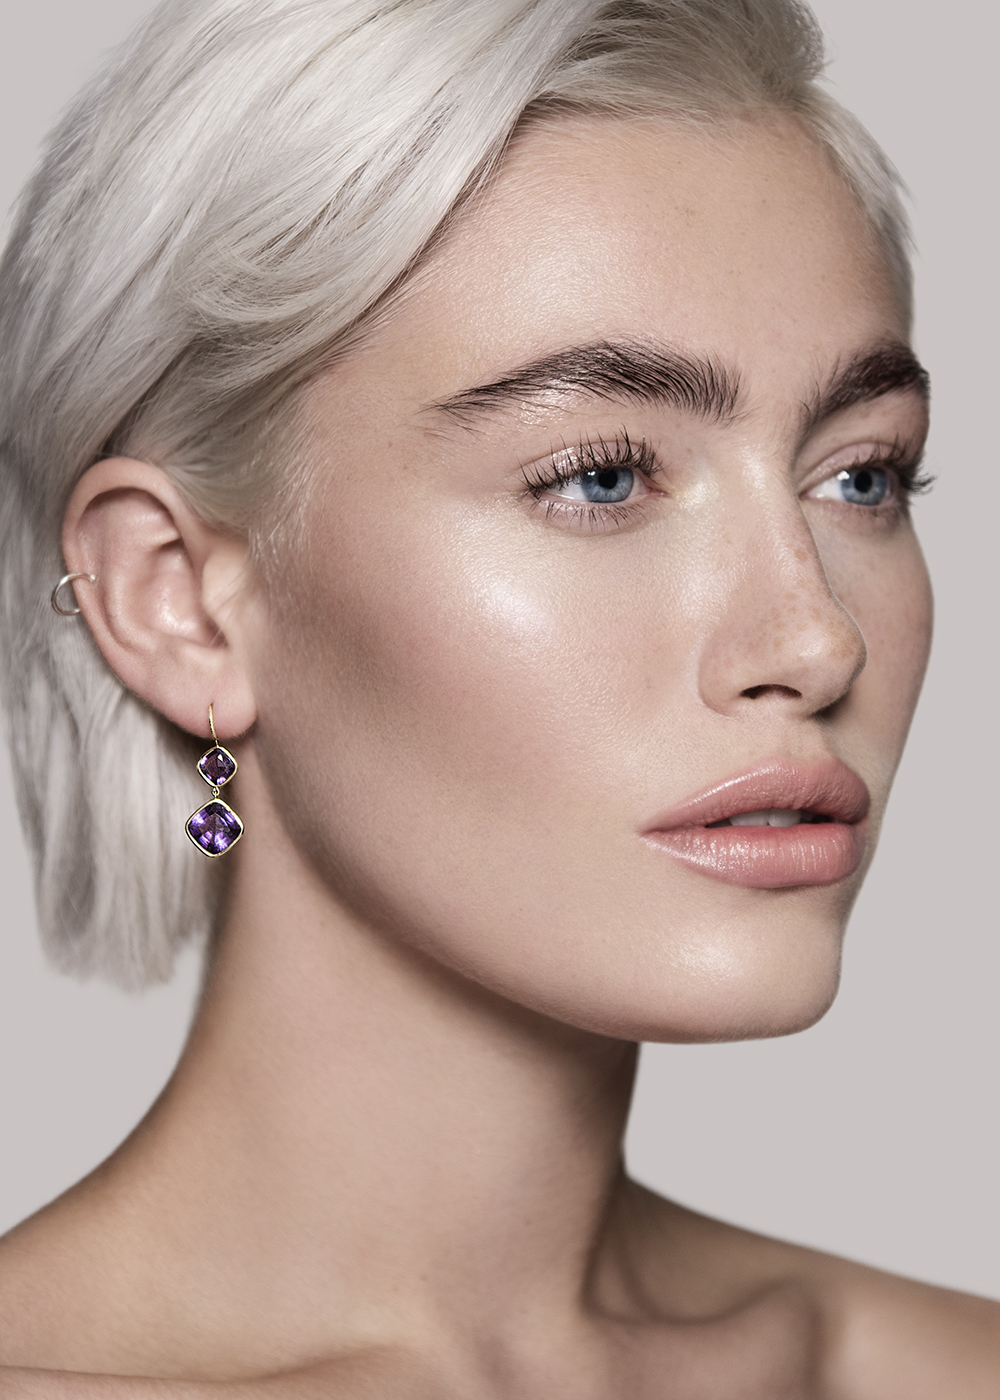 Lili Jewellery by Lisa Eldridge  Photography by Mateusz Sitek